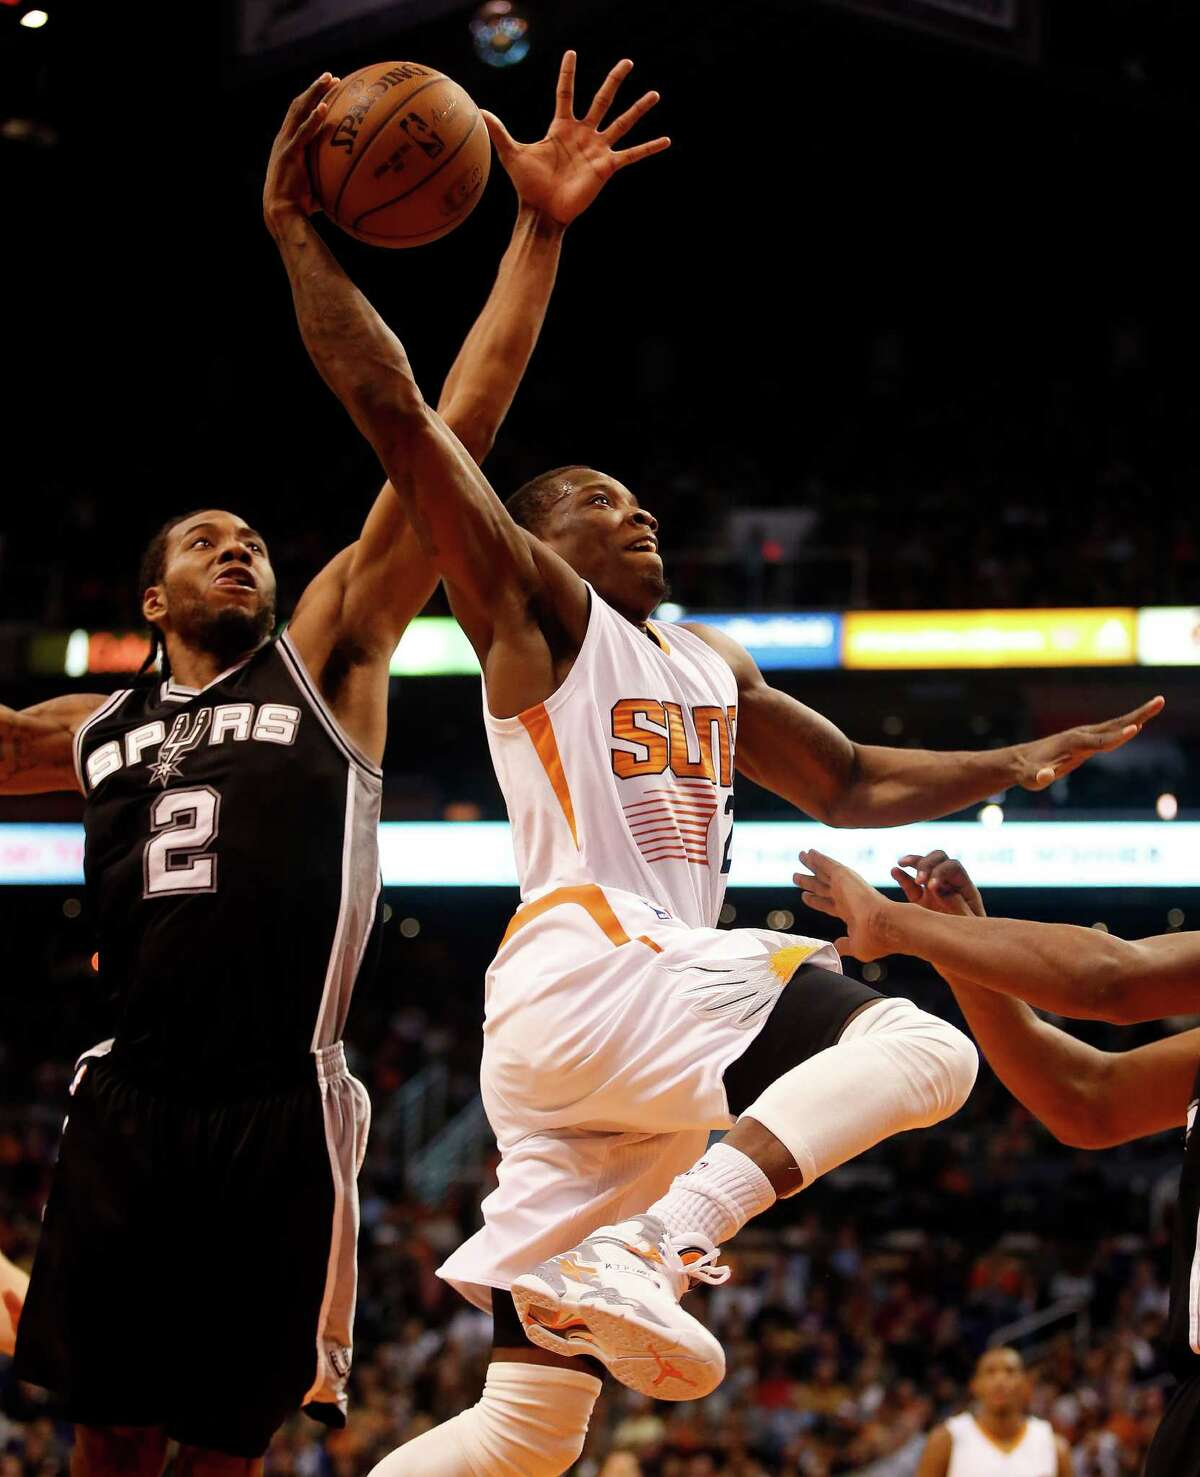 San Antonio Spurs forward Kawhi Leonard (2) blocks the shot on Phoenix Suns guard Eric Bledsoe (2) in the first quarter during an NBA basketball game, Saturday, Feb. 28, 2015, in Phoenix. (AP Photo/Rick Scuteri)